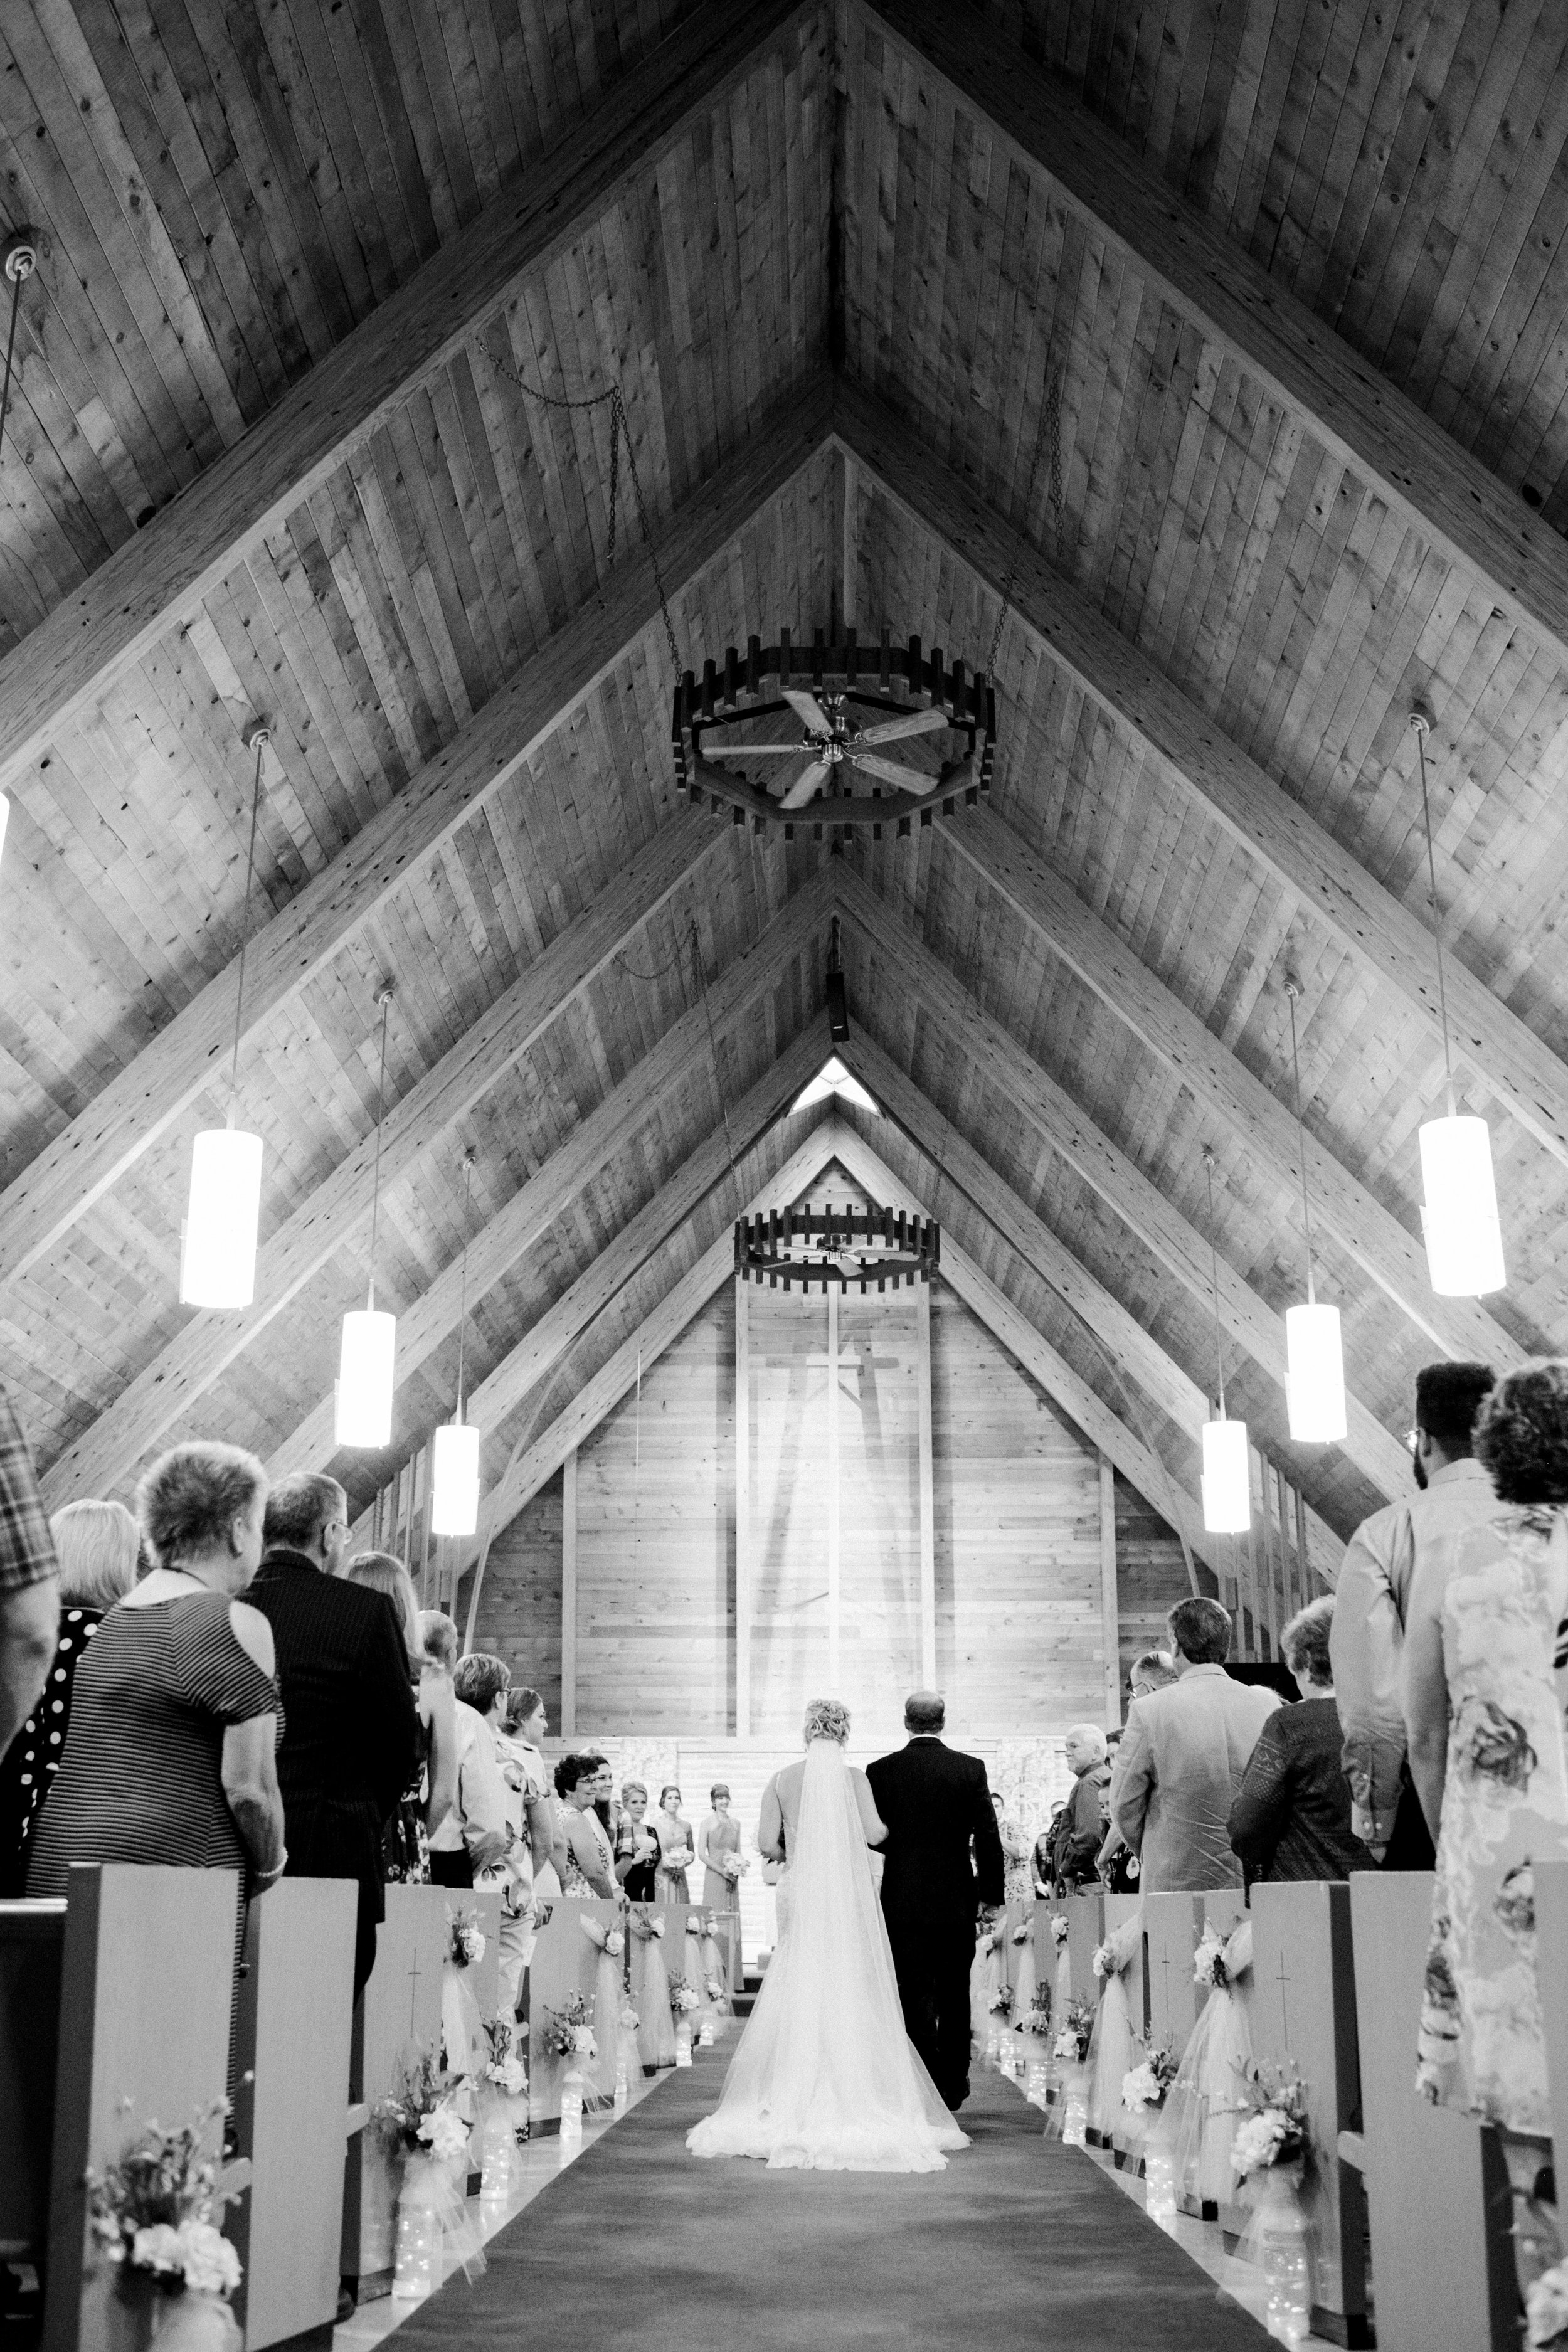 Bethany-Lutheran-Church-New-Libson-WI-Ceremony-Wedding-Photos-63.jpg